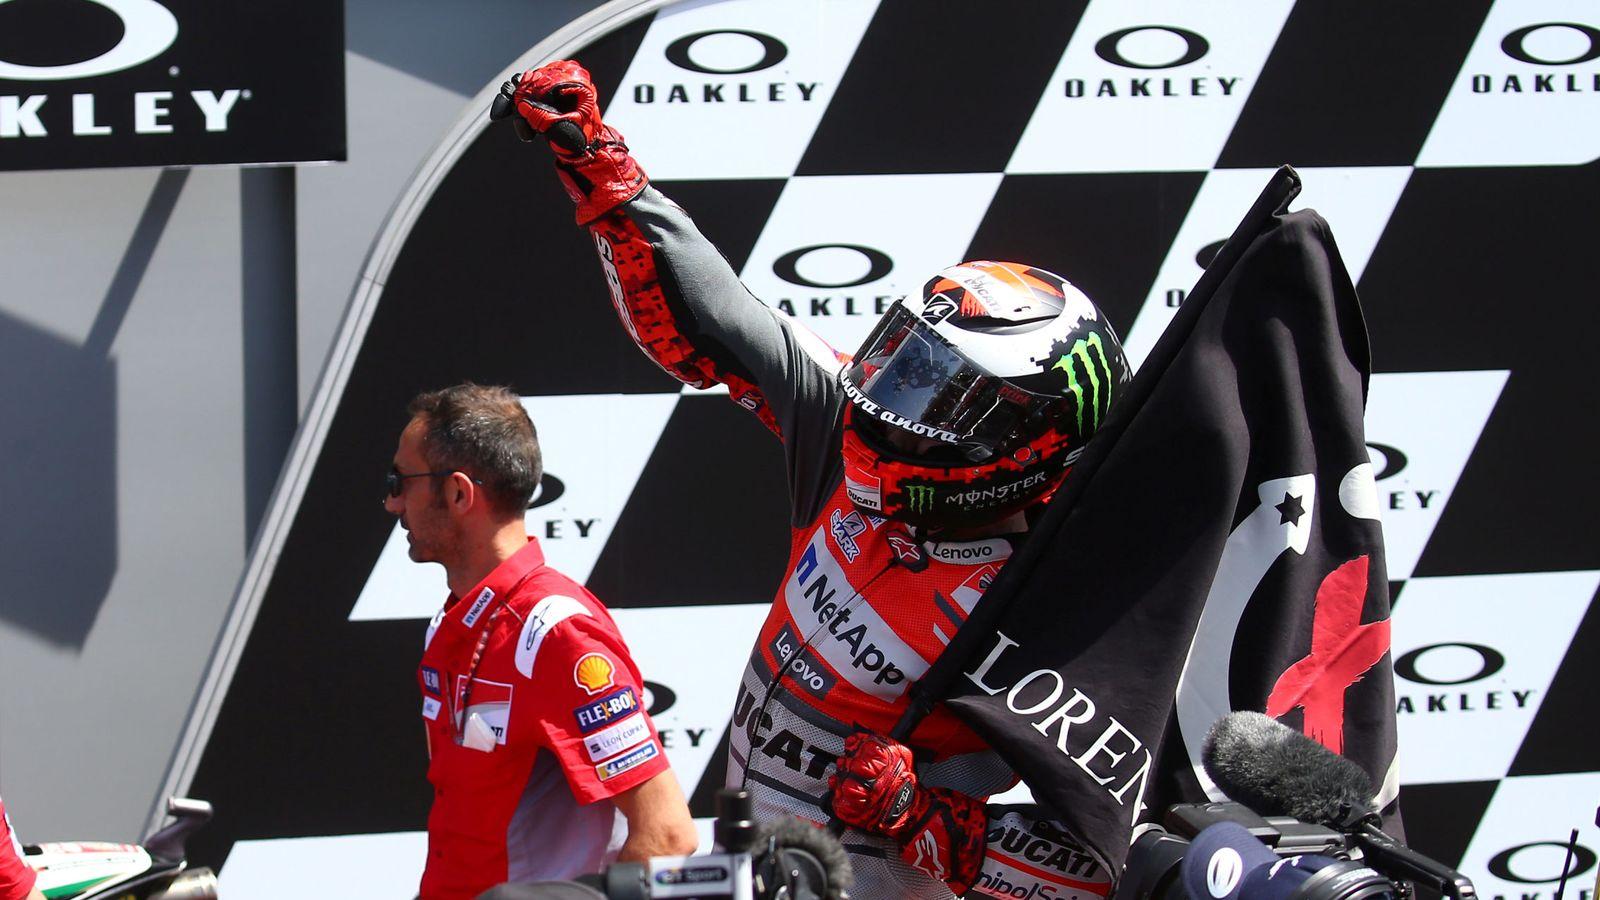 Foto: Jorge Lorenzo, ganador en Mugello. (Reuters)